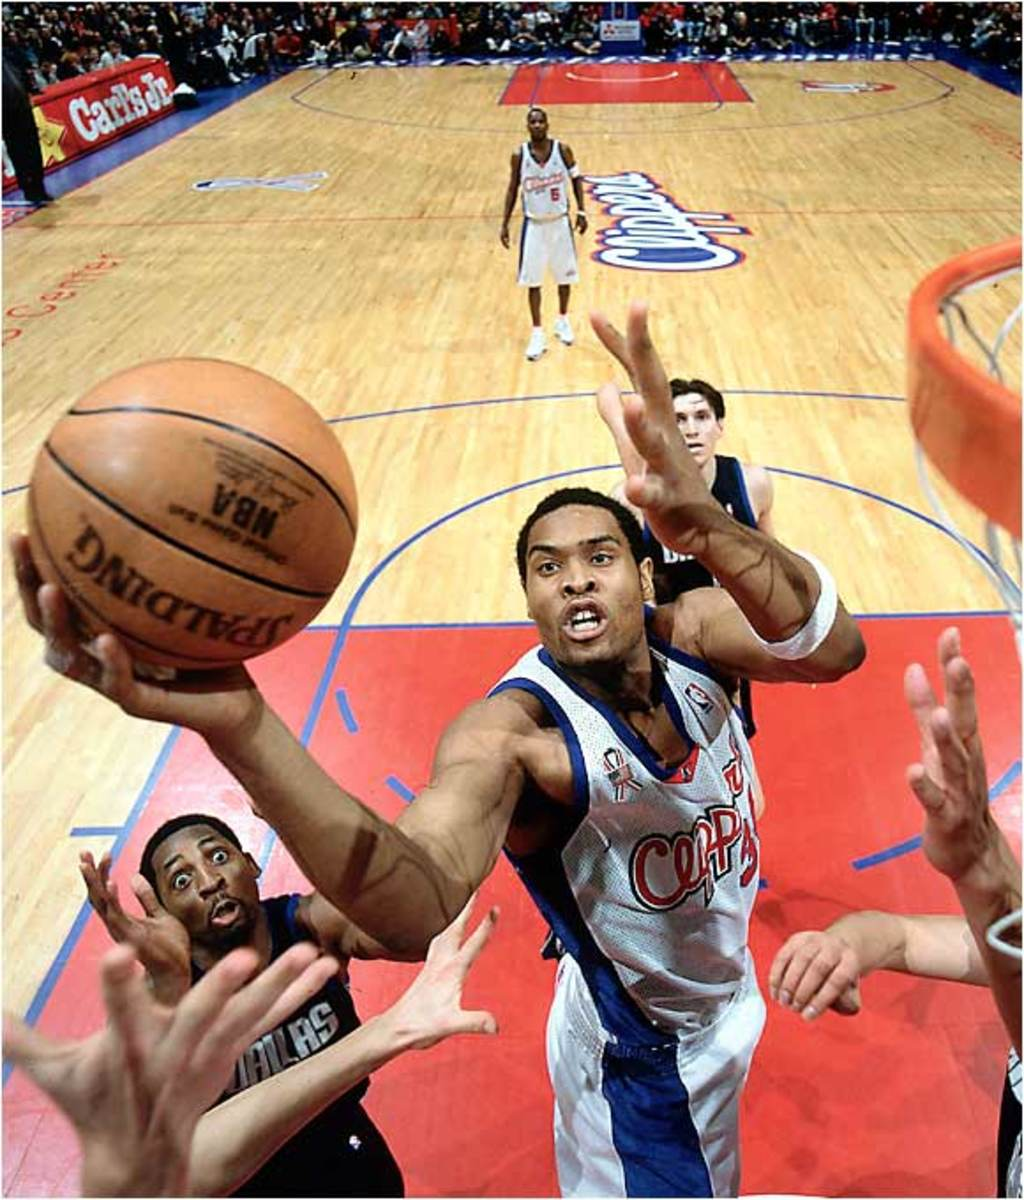 Michael Olowokandi, Clippers